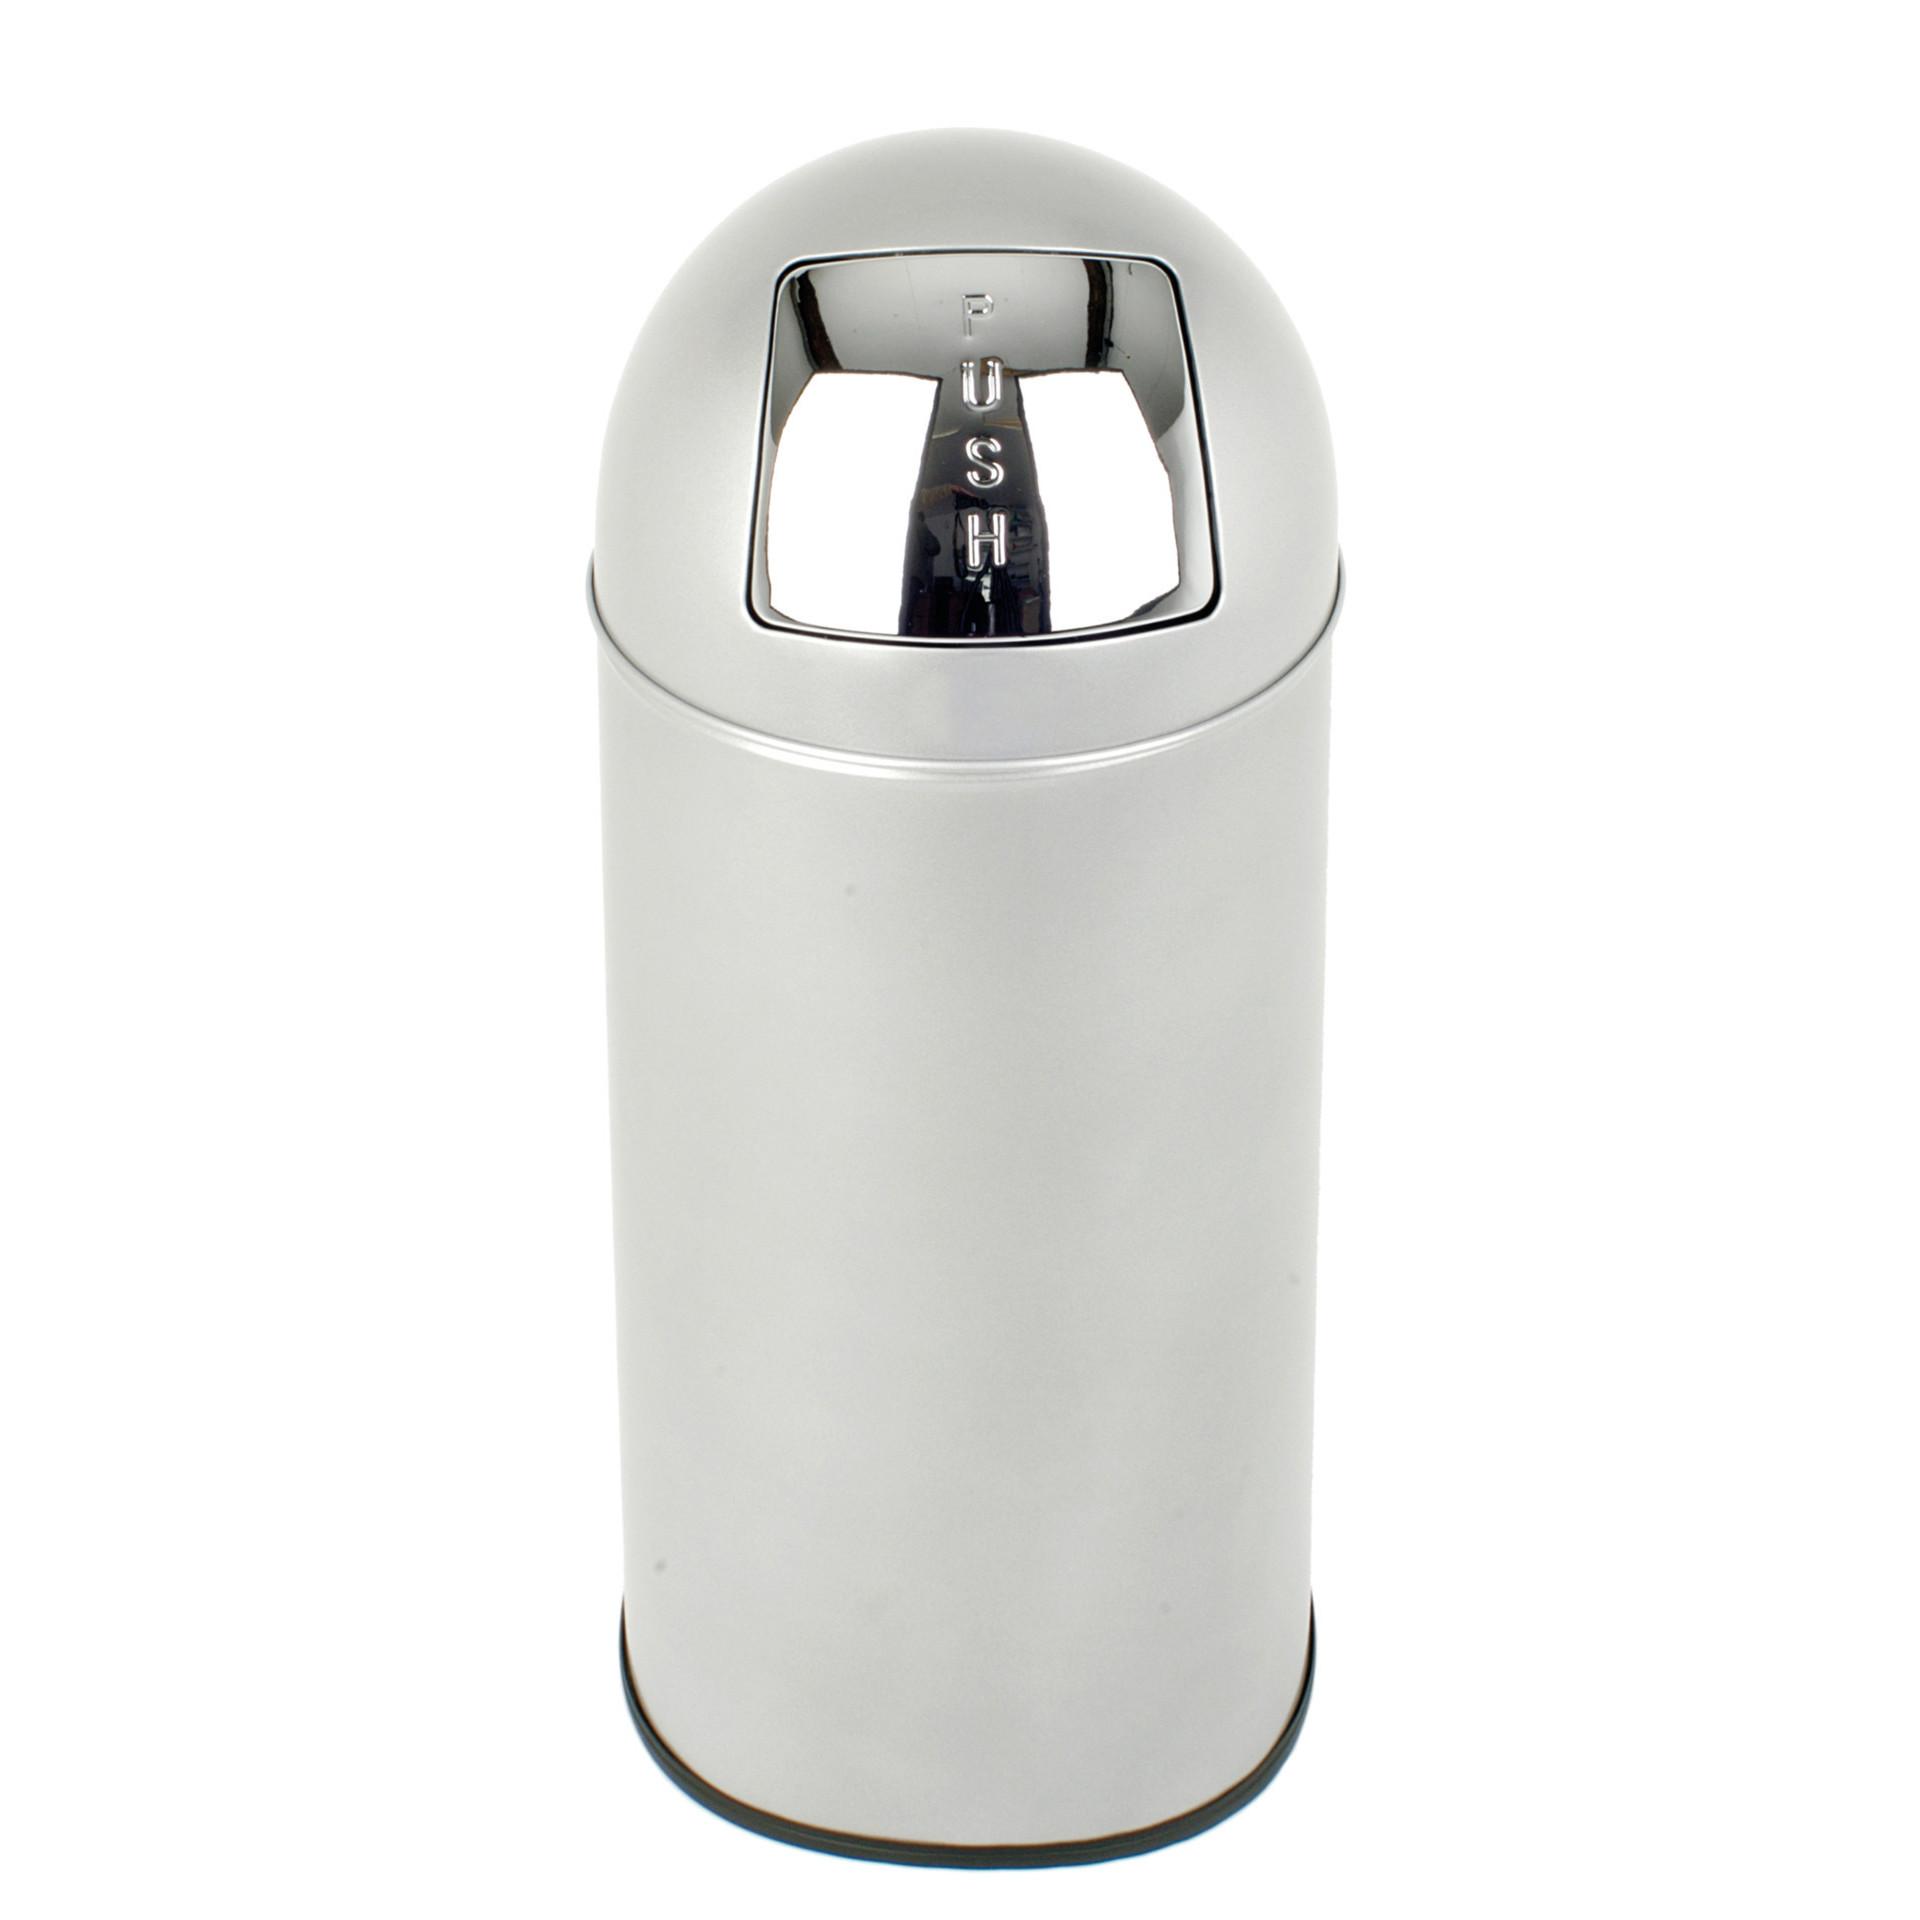 Abfallbehälter, mit Push-Deckel, 40,0 l, rund, Edelstahl matt